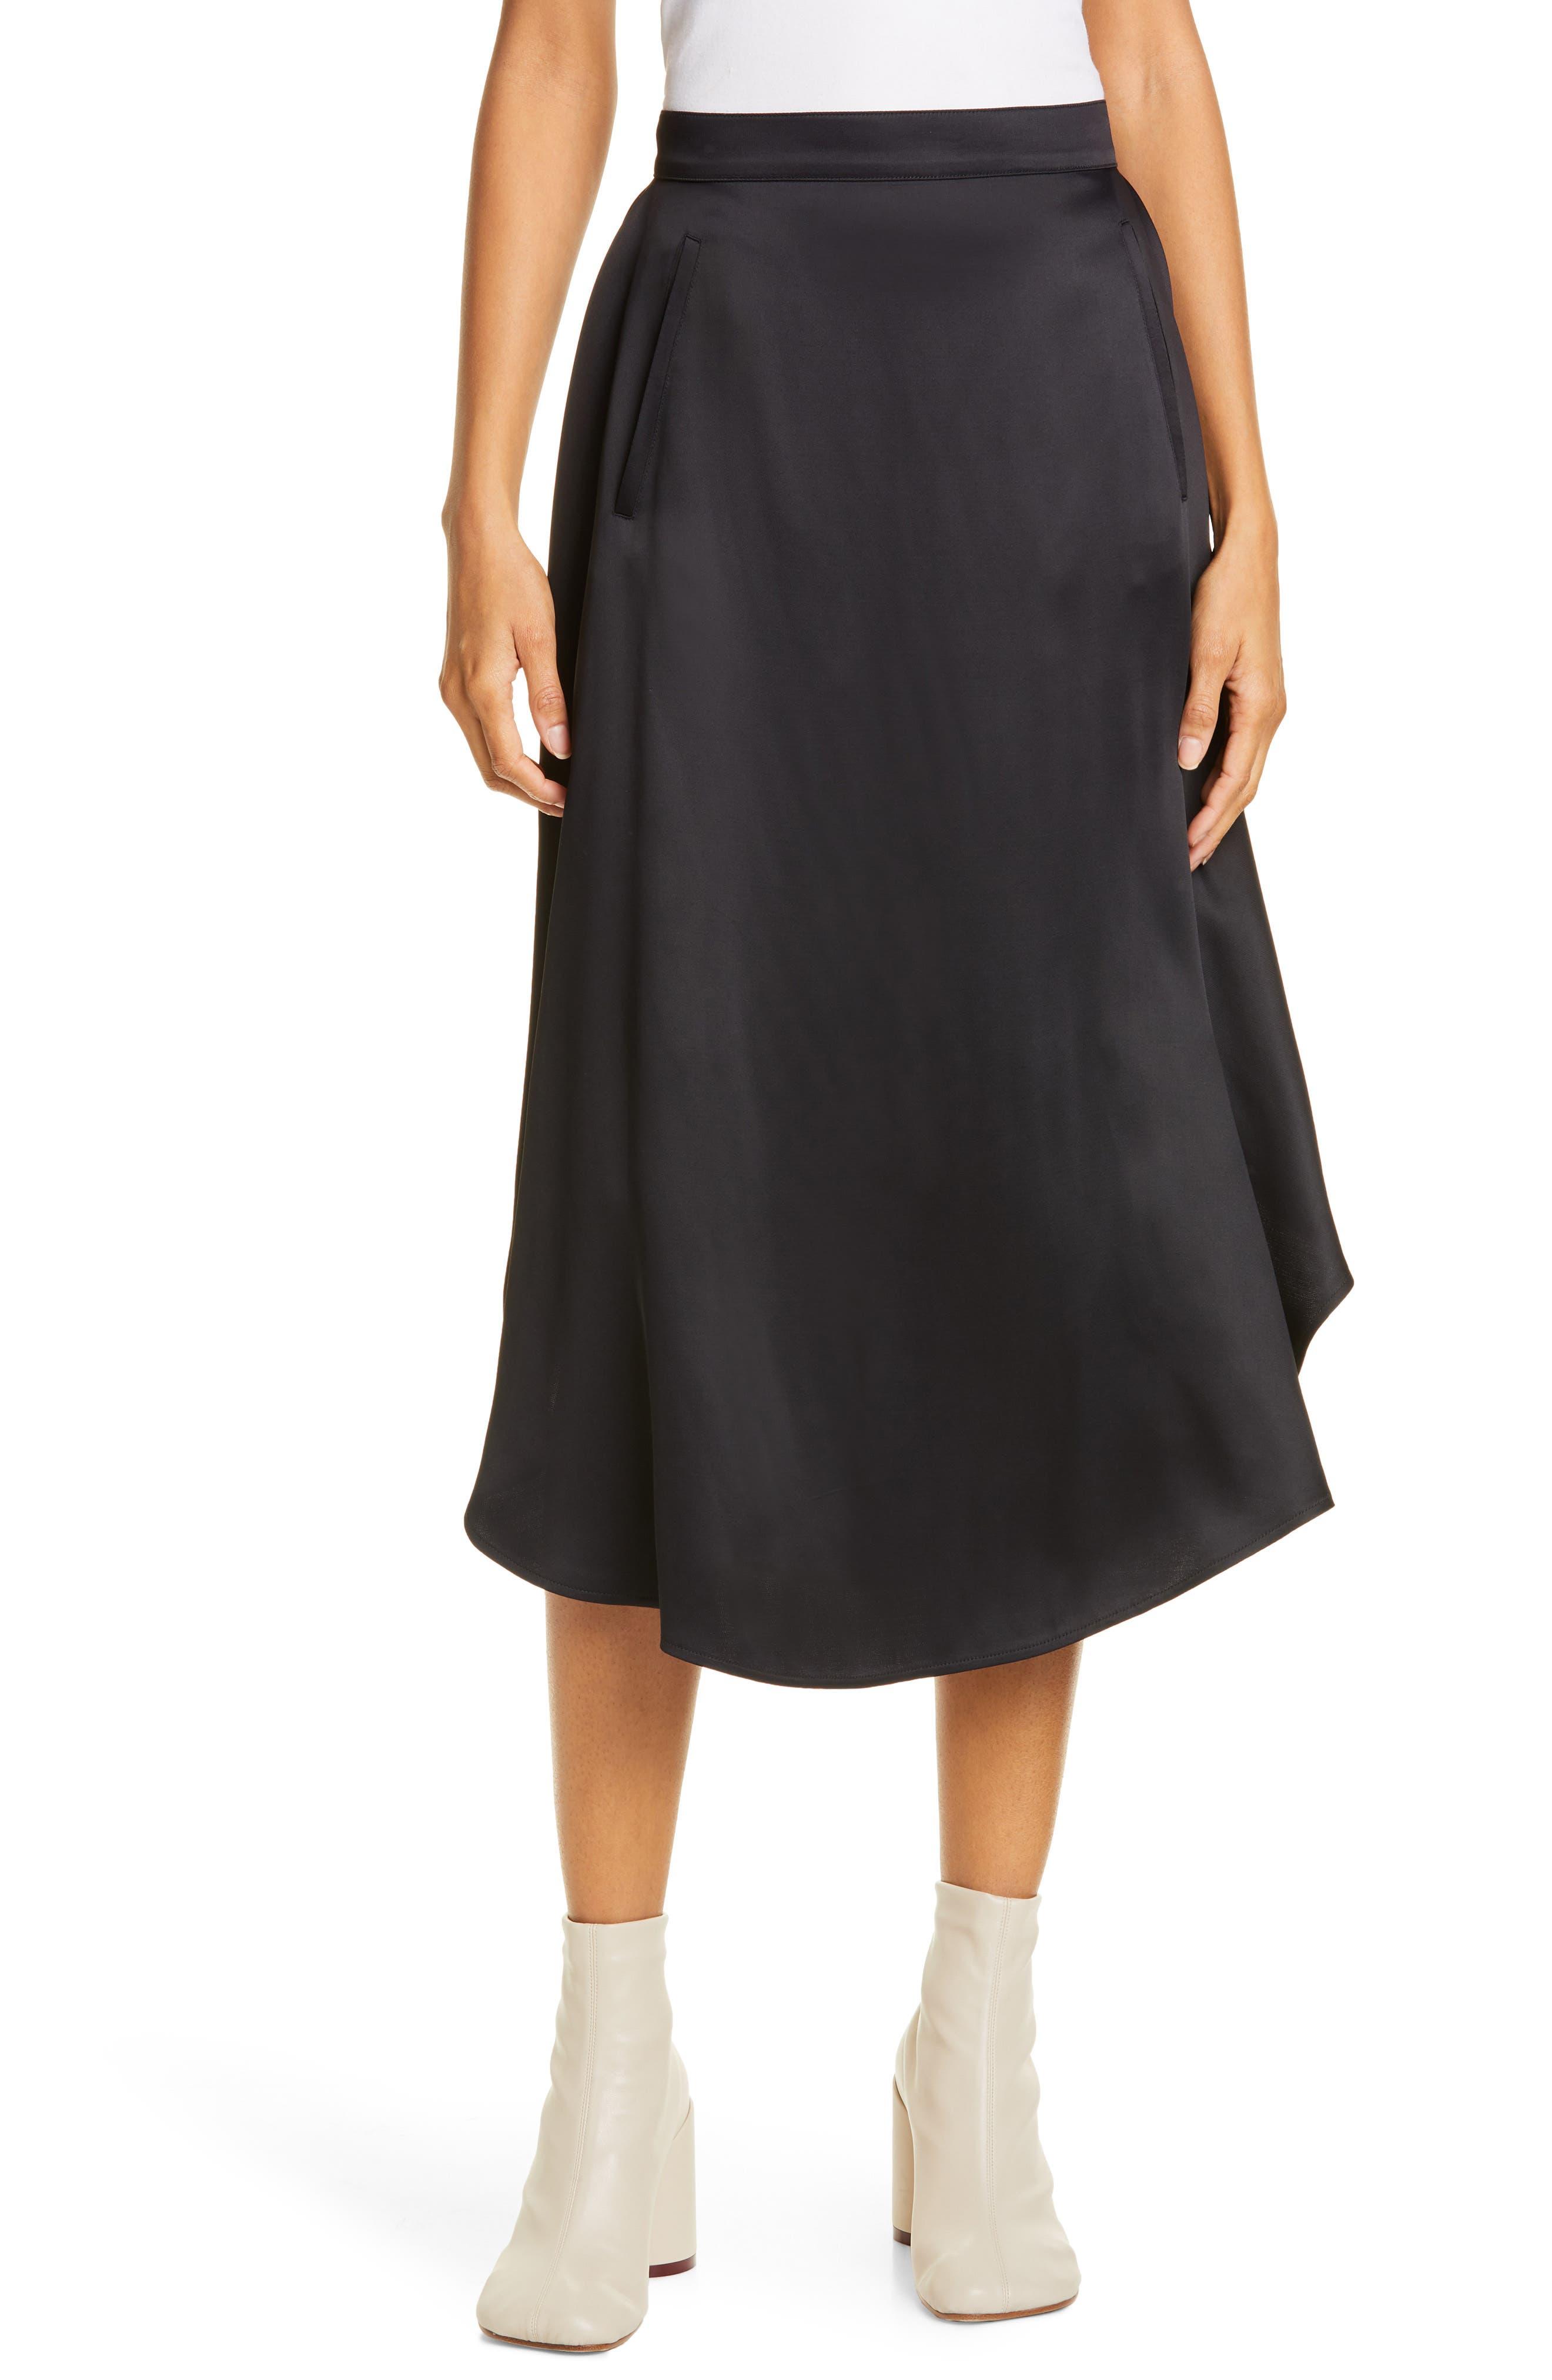 Mm6 Maison Margiela Skirts Silky Circle Skirt